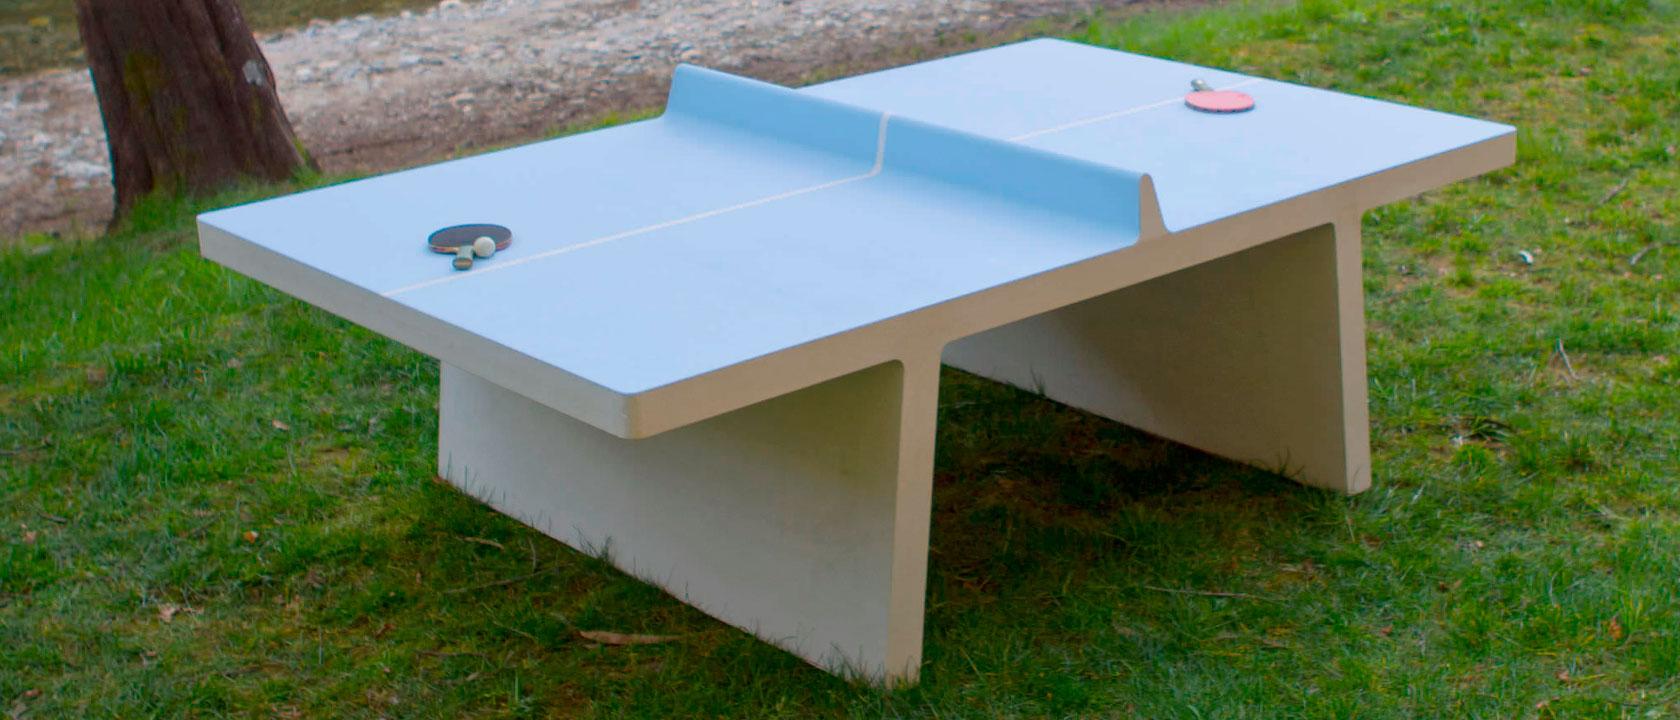 La mejor ubicaci n para una mesa de ping pong de hormig n for Dimensiones mesa ping pong